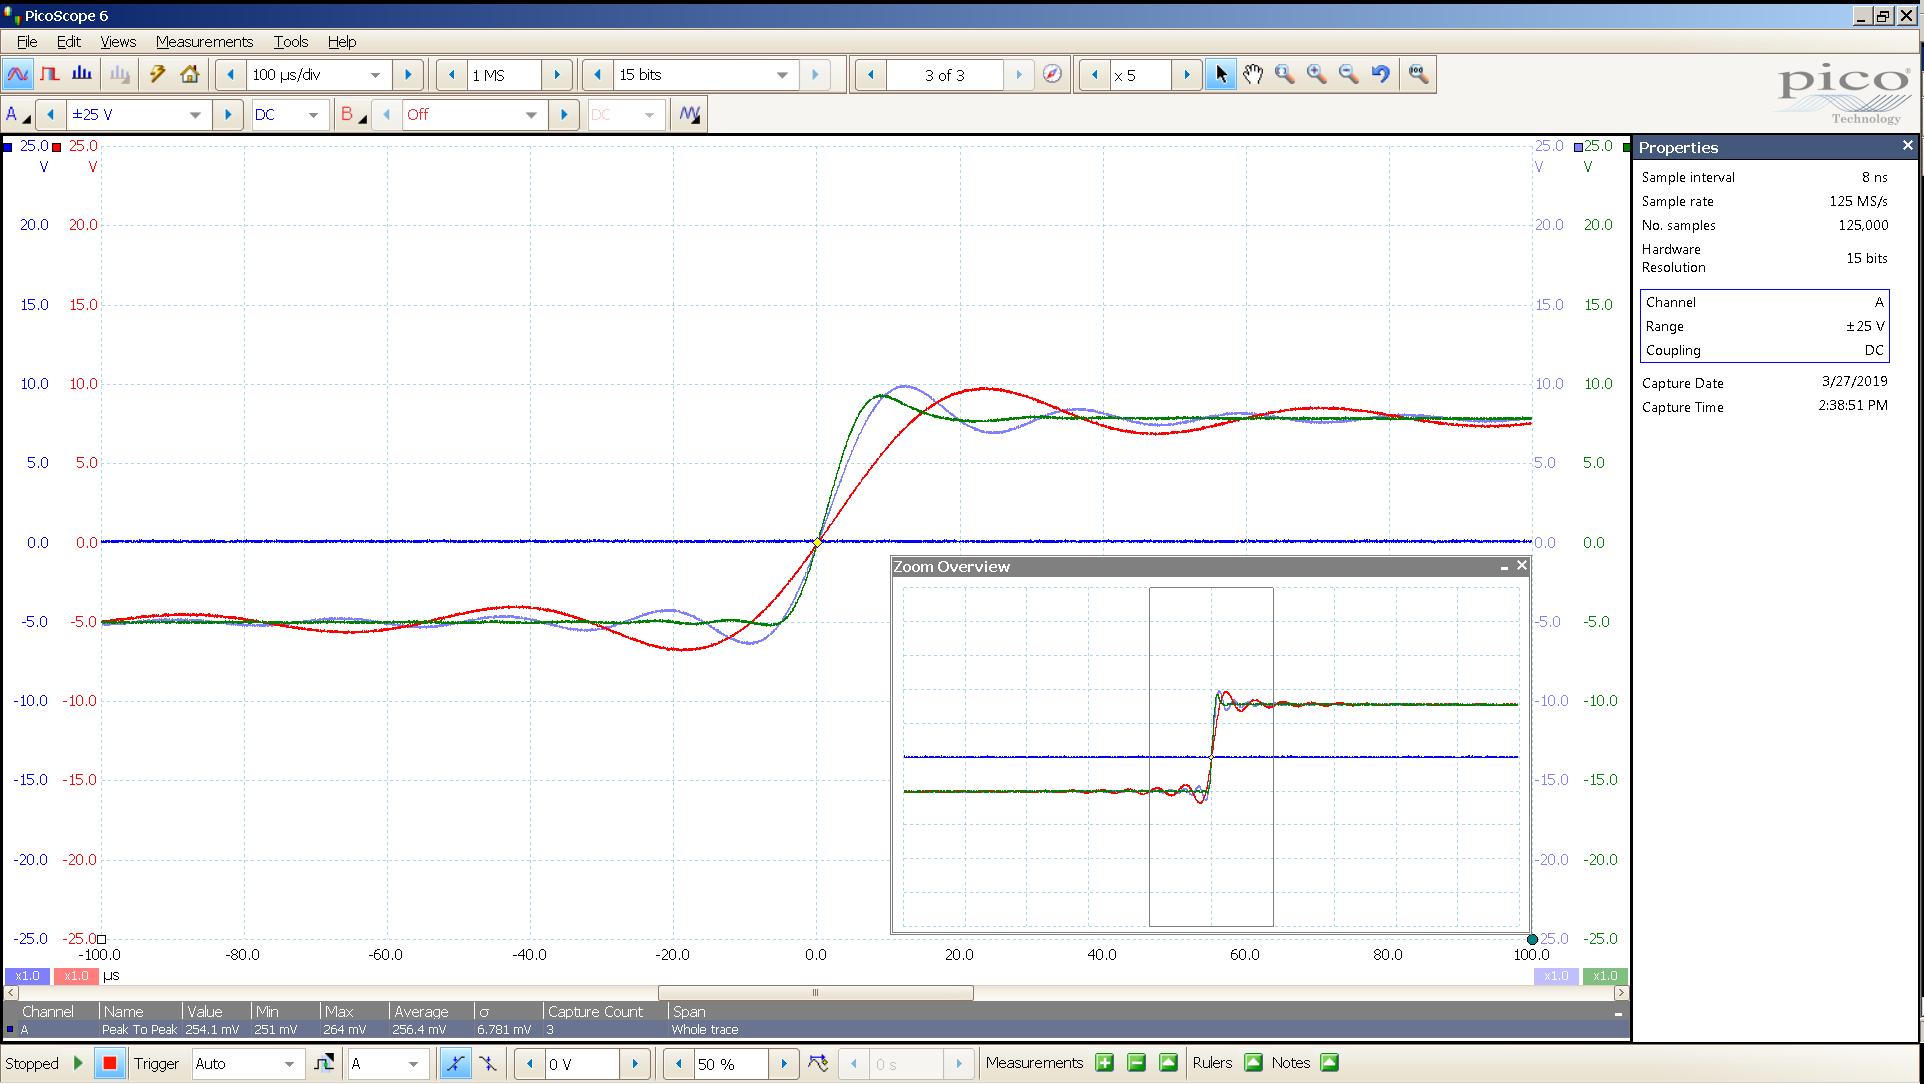 20190323-26 solaris Bal 20 Hz sqr -3 dBFS 16 Vpp 100uS div - AES 44 88 176K overlay.PNG